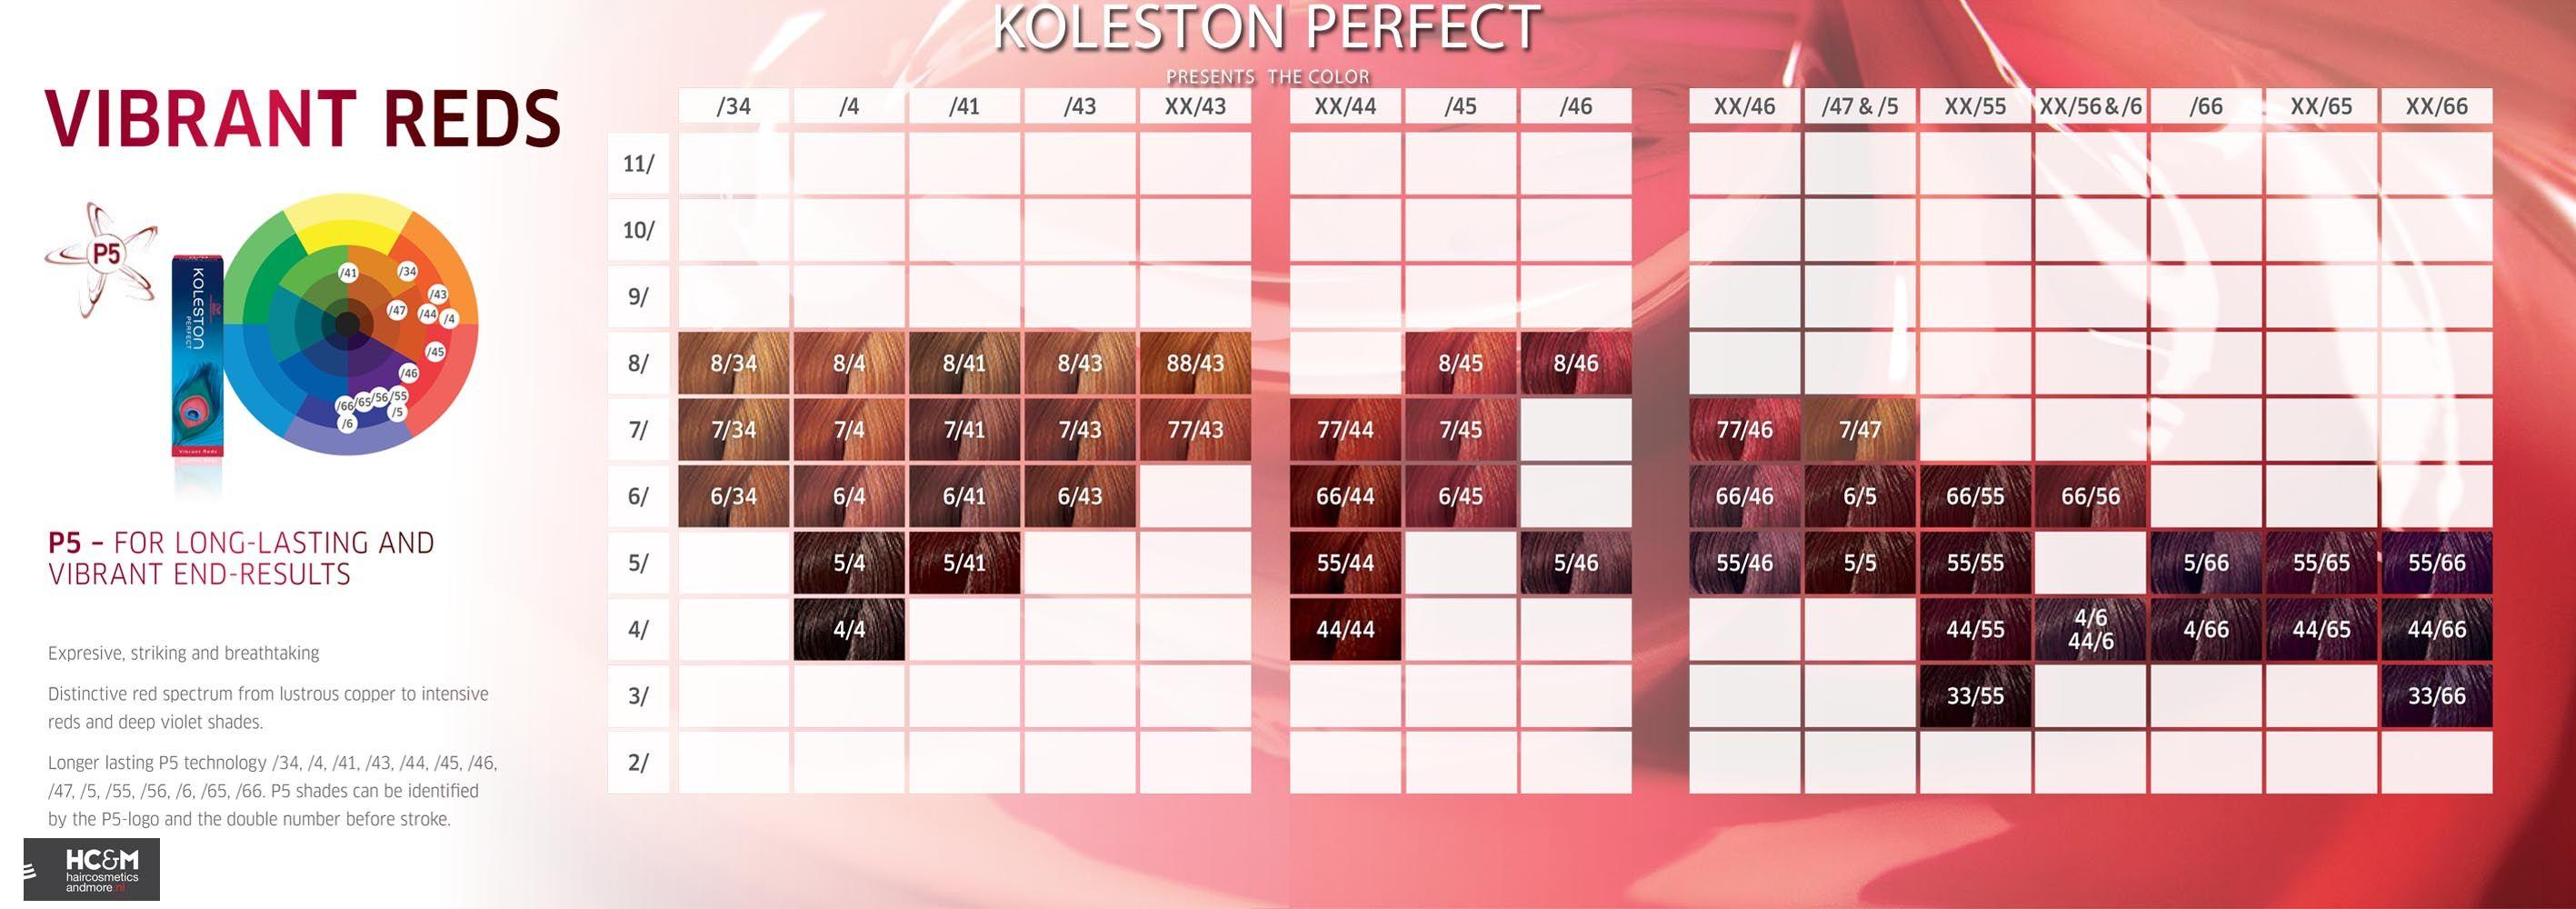 Wella Professionals Koleston Perfect Presents The Color Vibrant